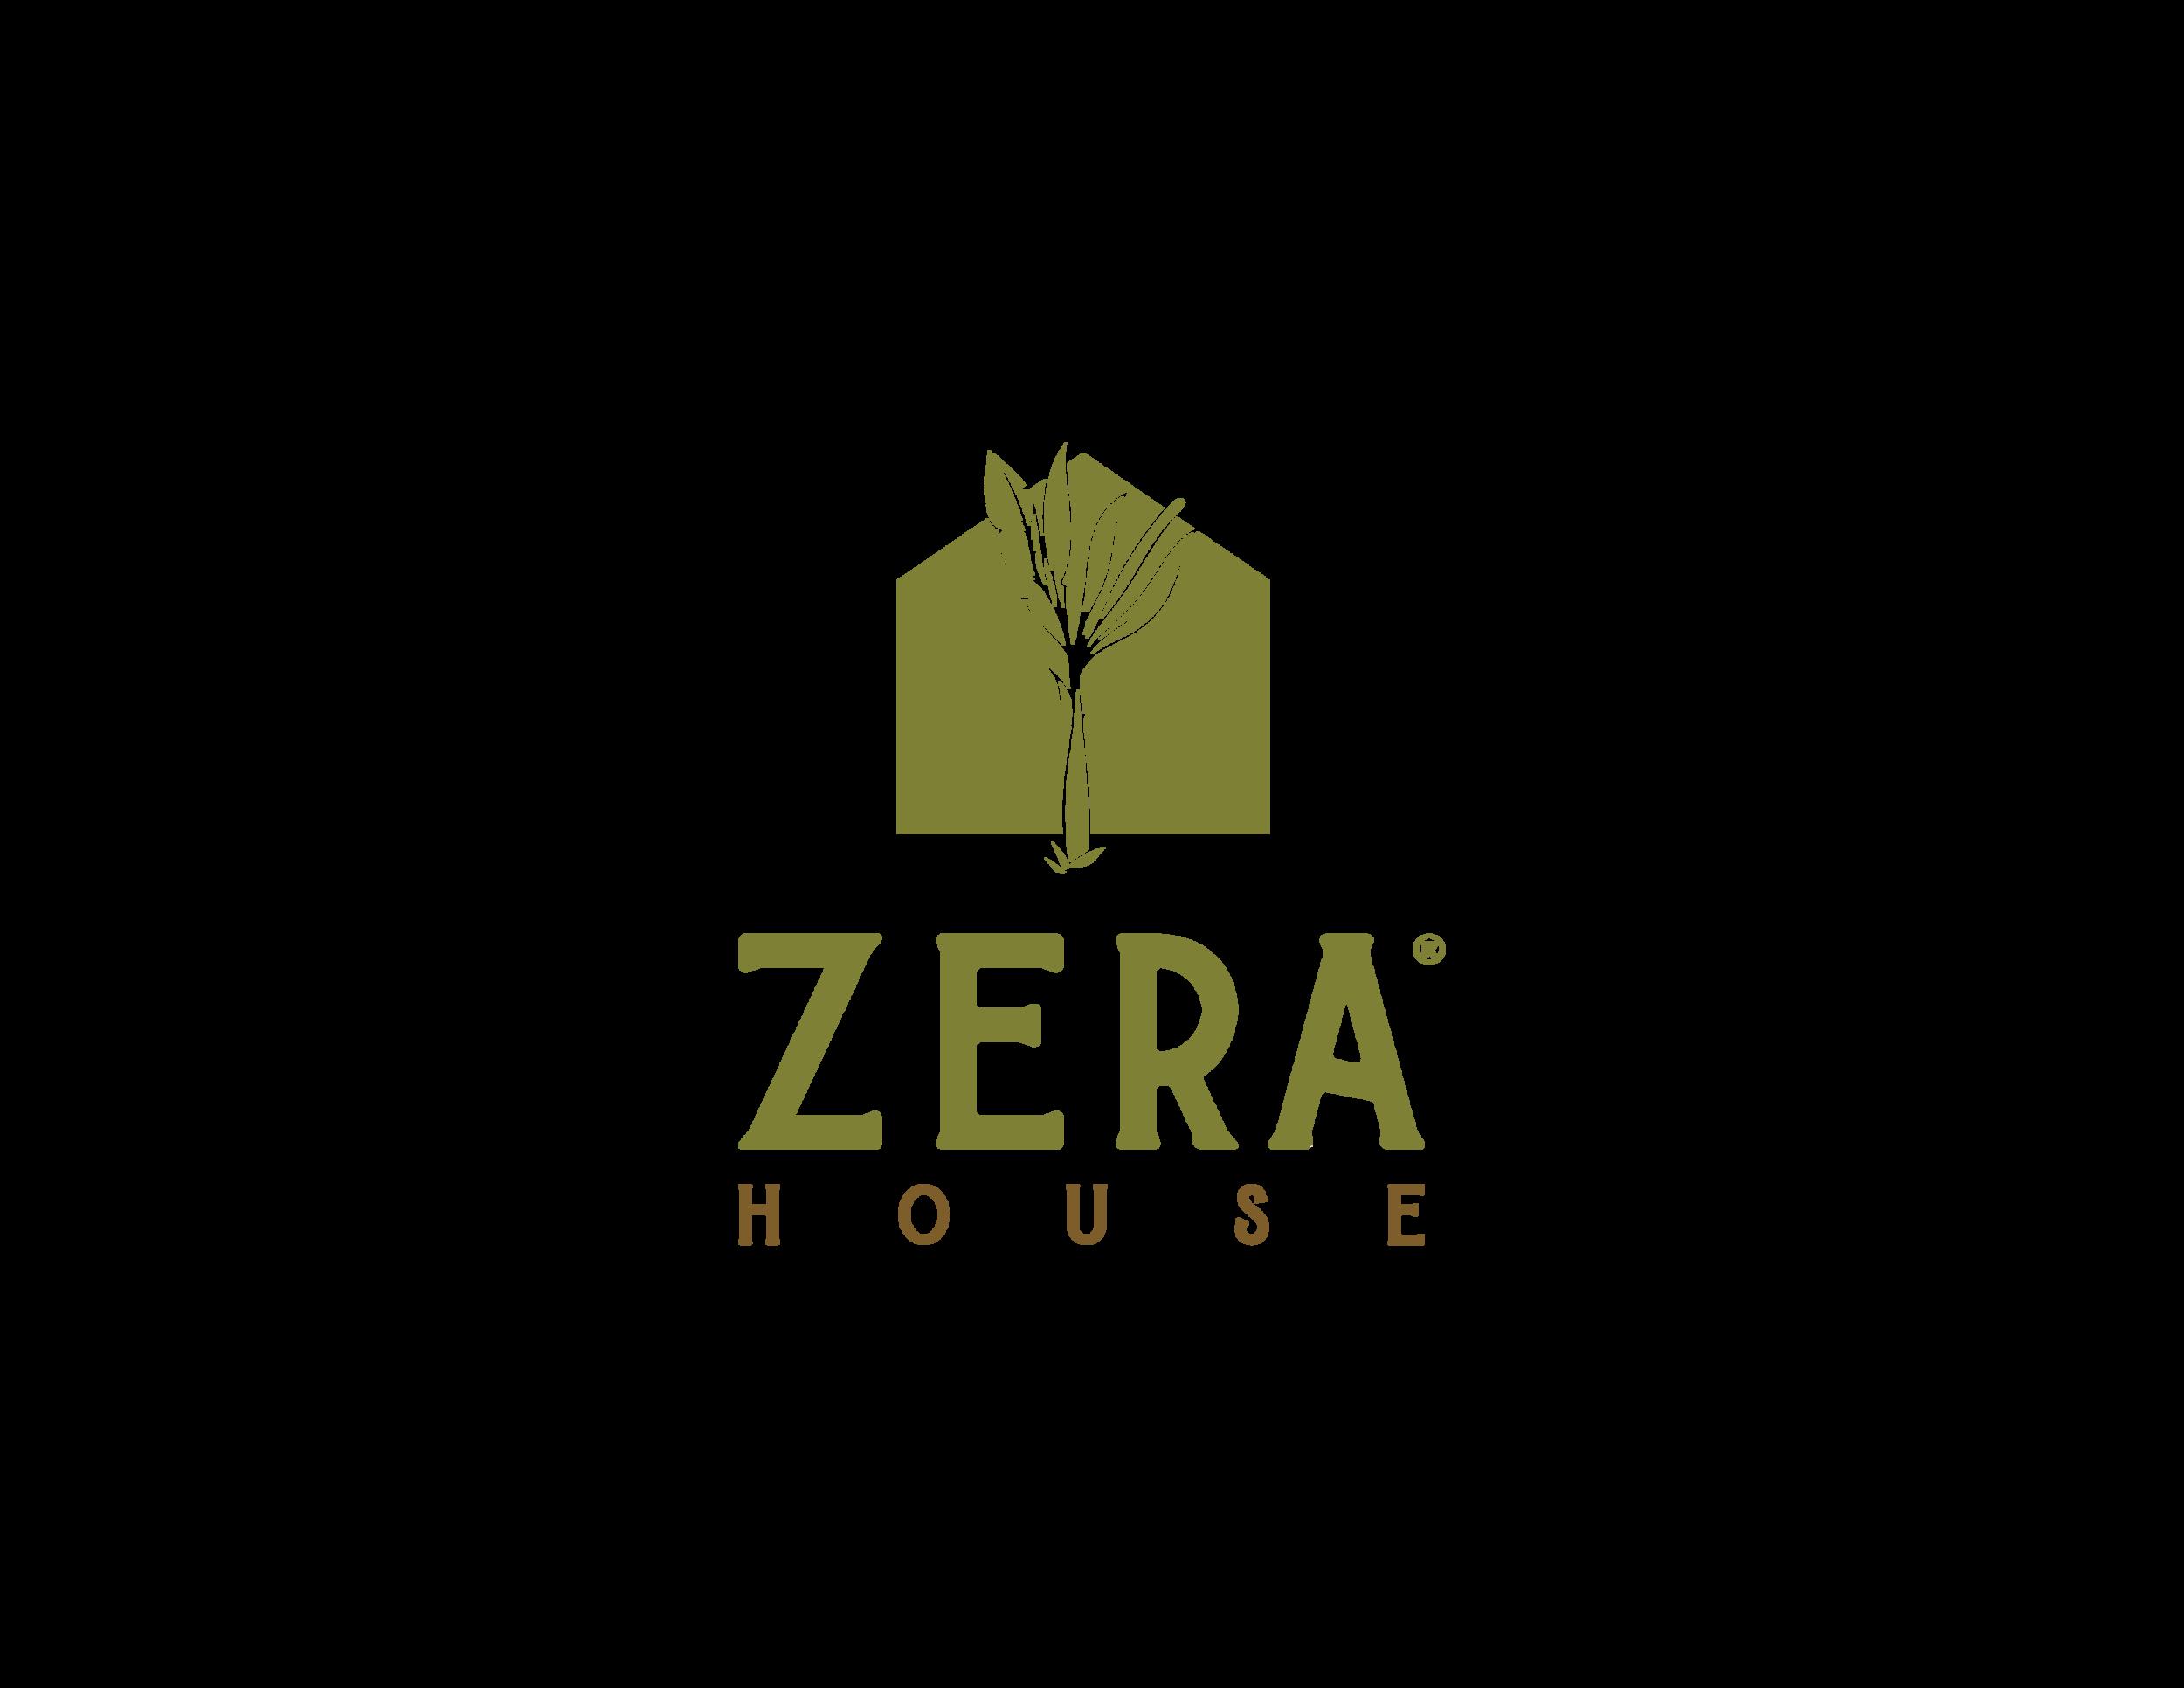 zera_house_4c.png